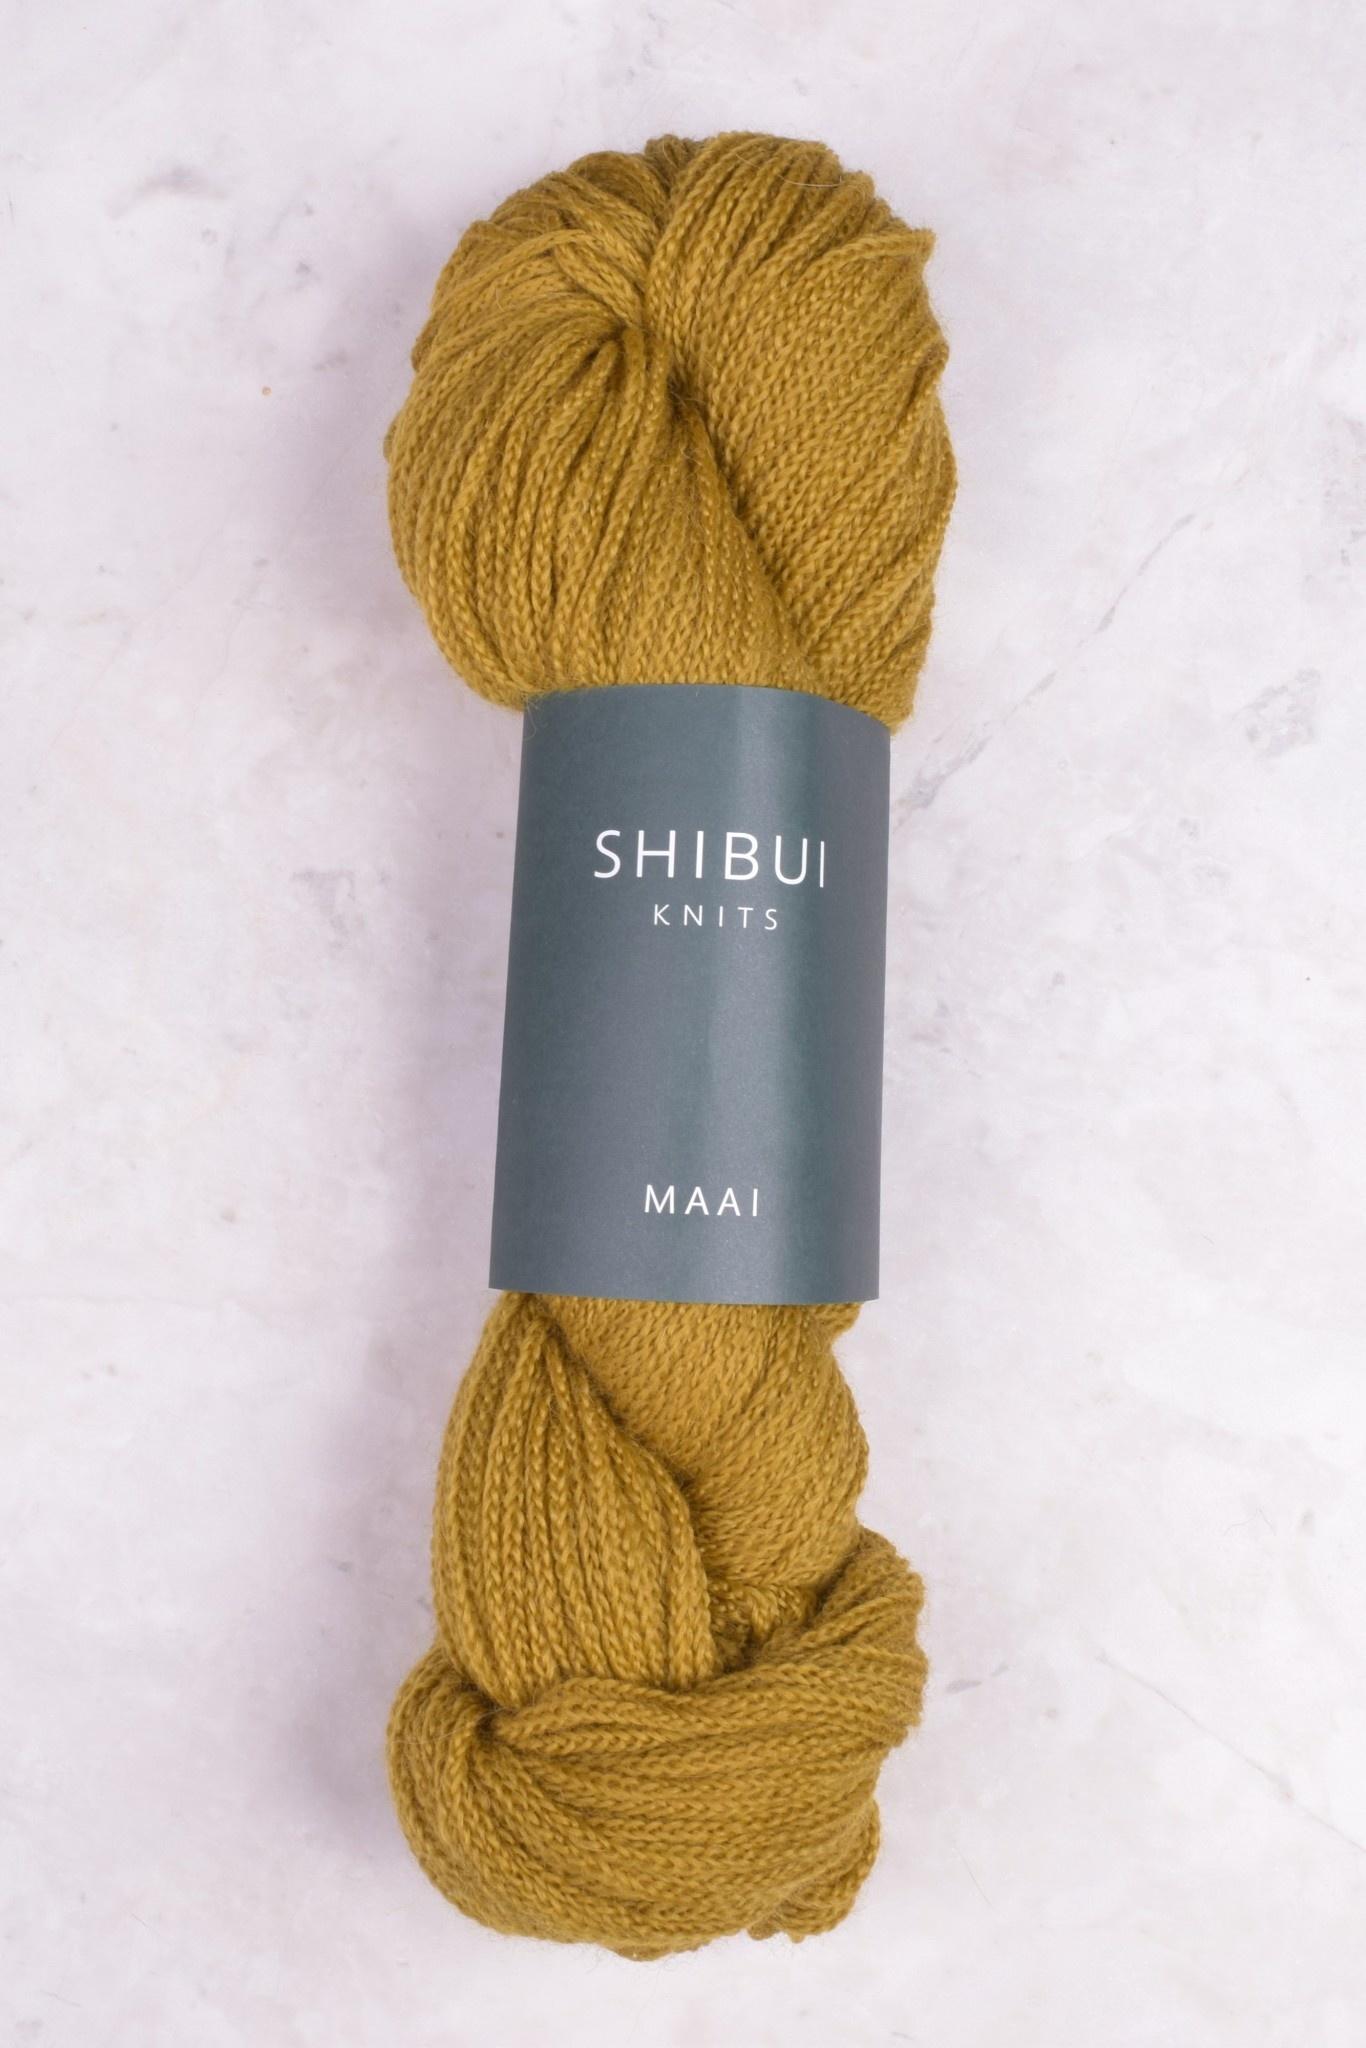 Image of Shibui Maai 2041 Pollen (Discontinued)